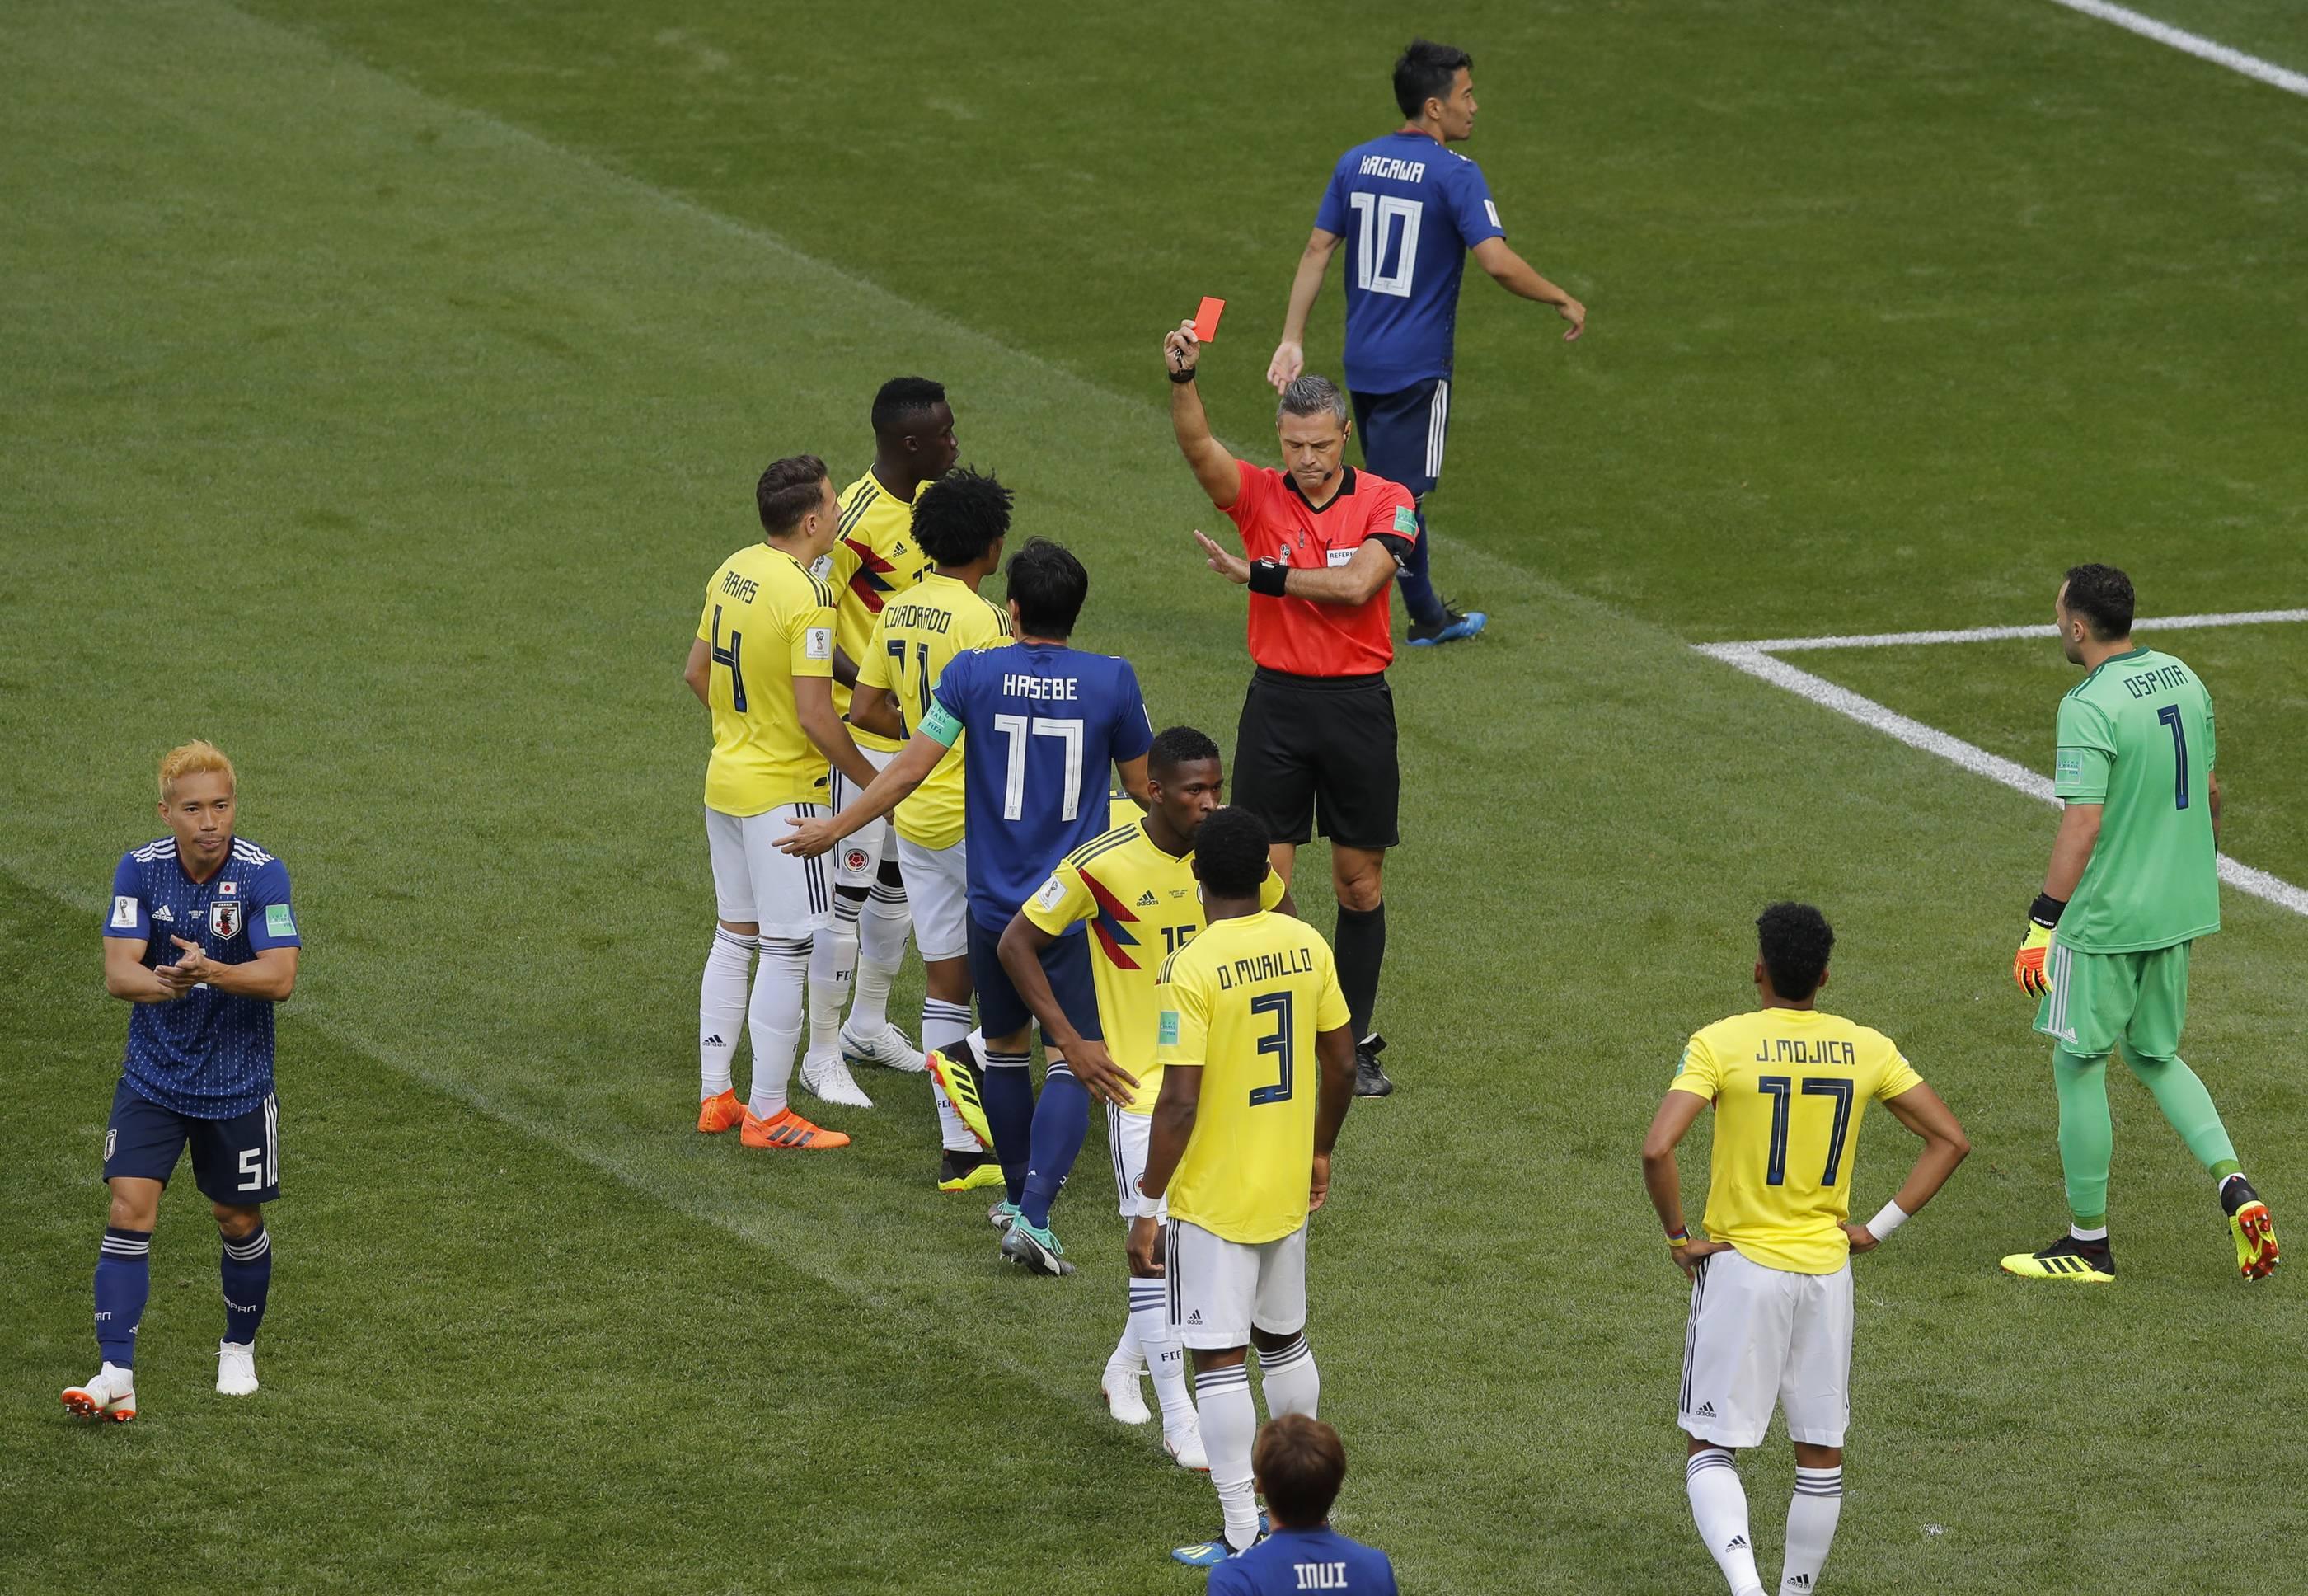 Rote Karte Wm 2018.Wm 2018 Kolumbien Gegen Japan Die Bilder Des Spiels